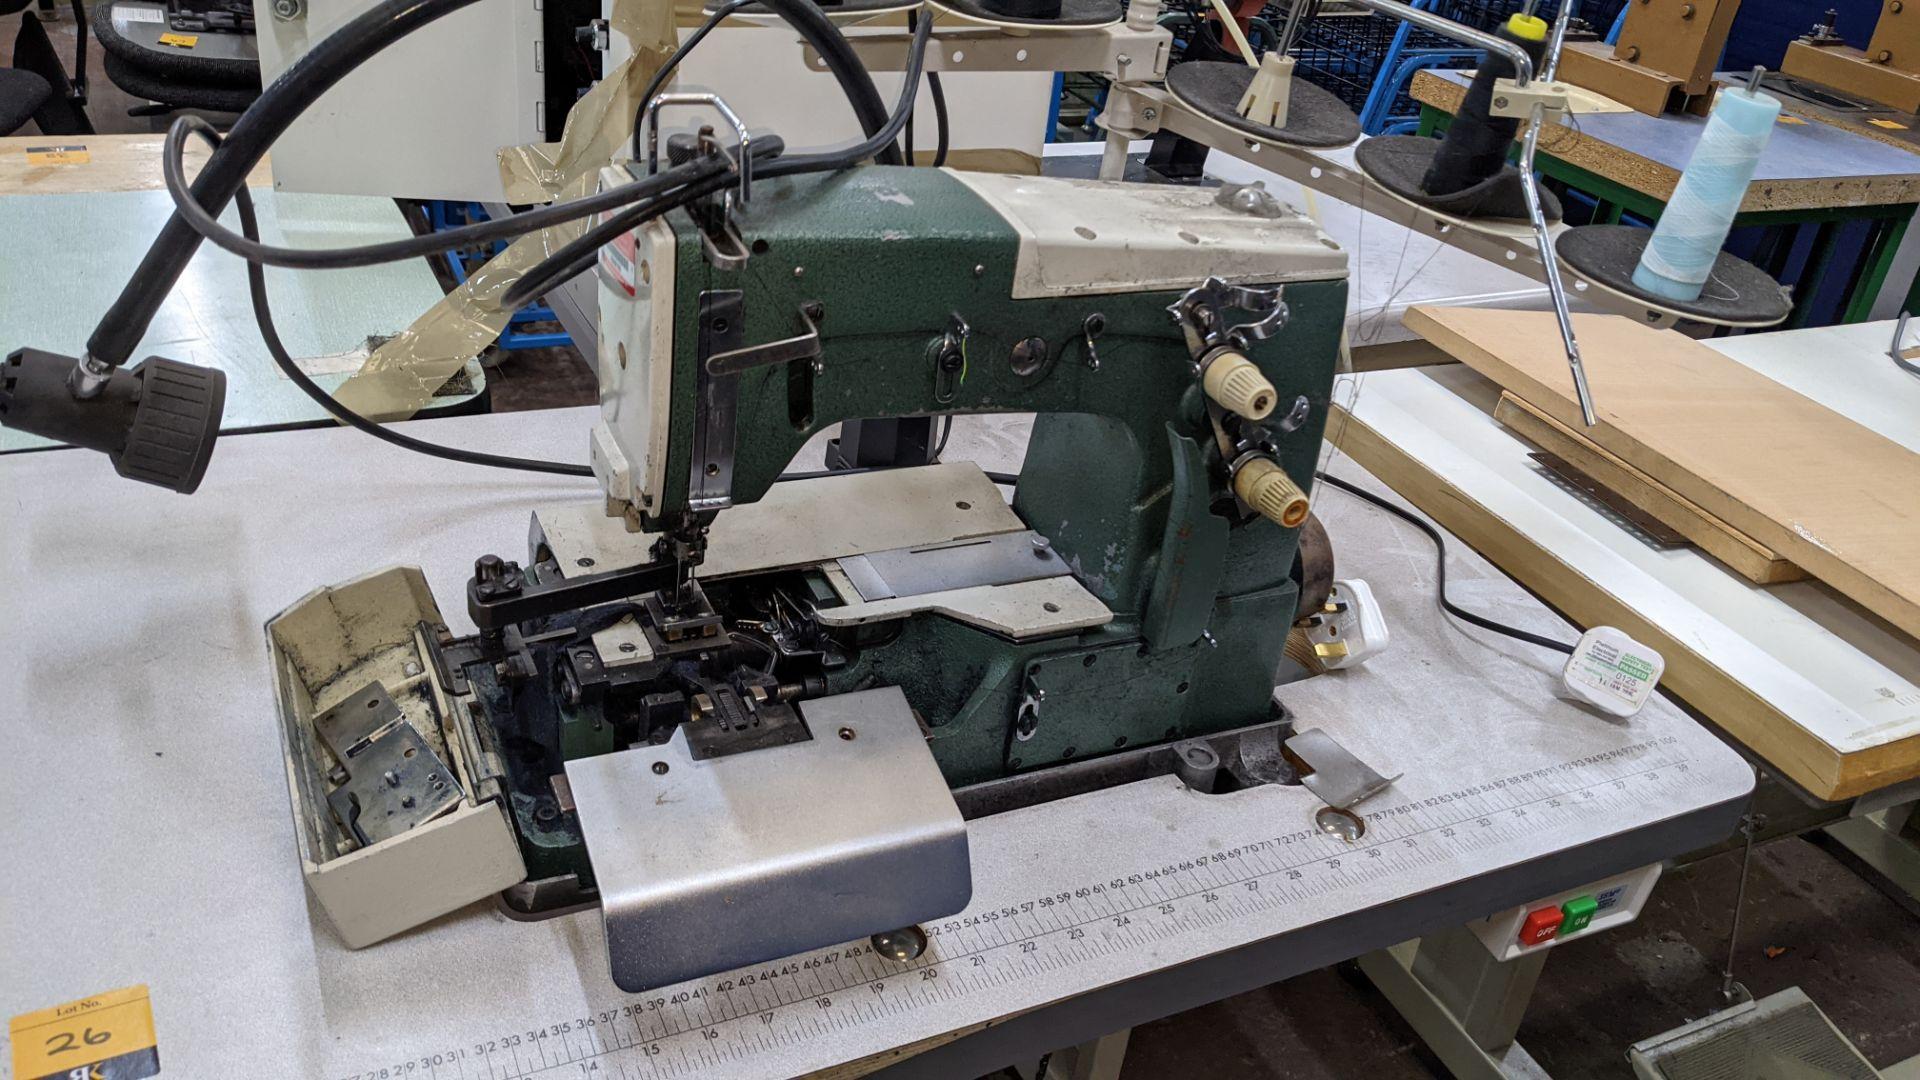 Sewing machine - Image 5 of 16